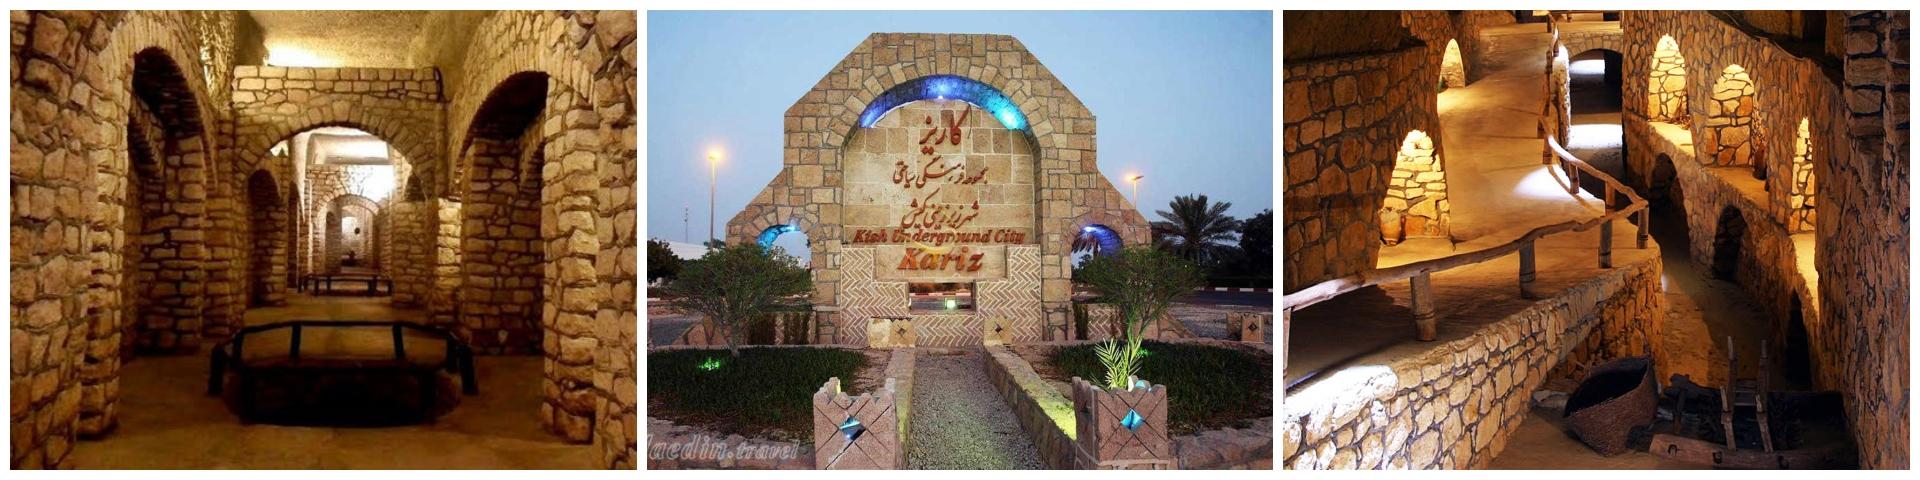 شهر کاریز